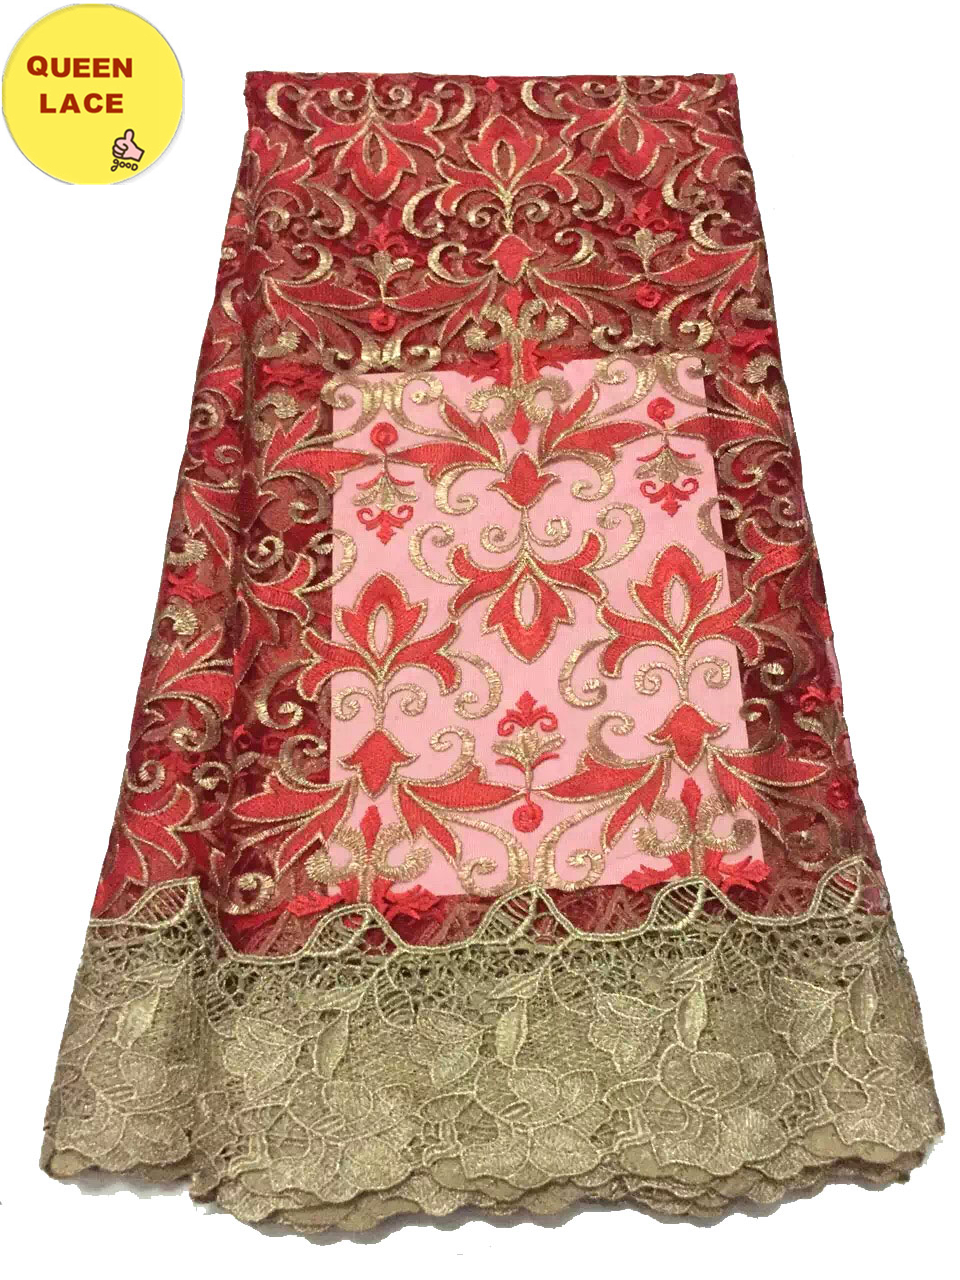 2016 Latest Nigerian Tulle Lace French Net Lace Fabrics Royalblue Guipure Lace Fabric For Wedding Dresses(China (Mainland))